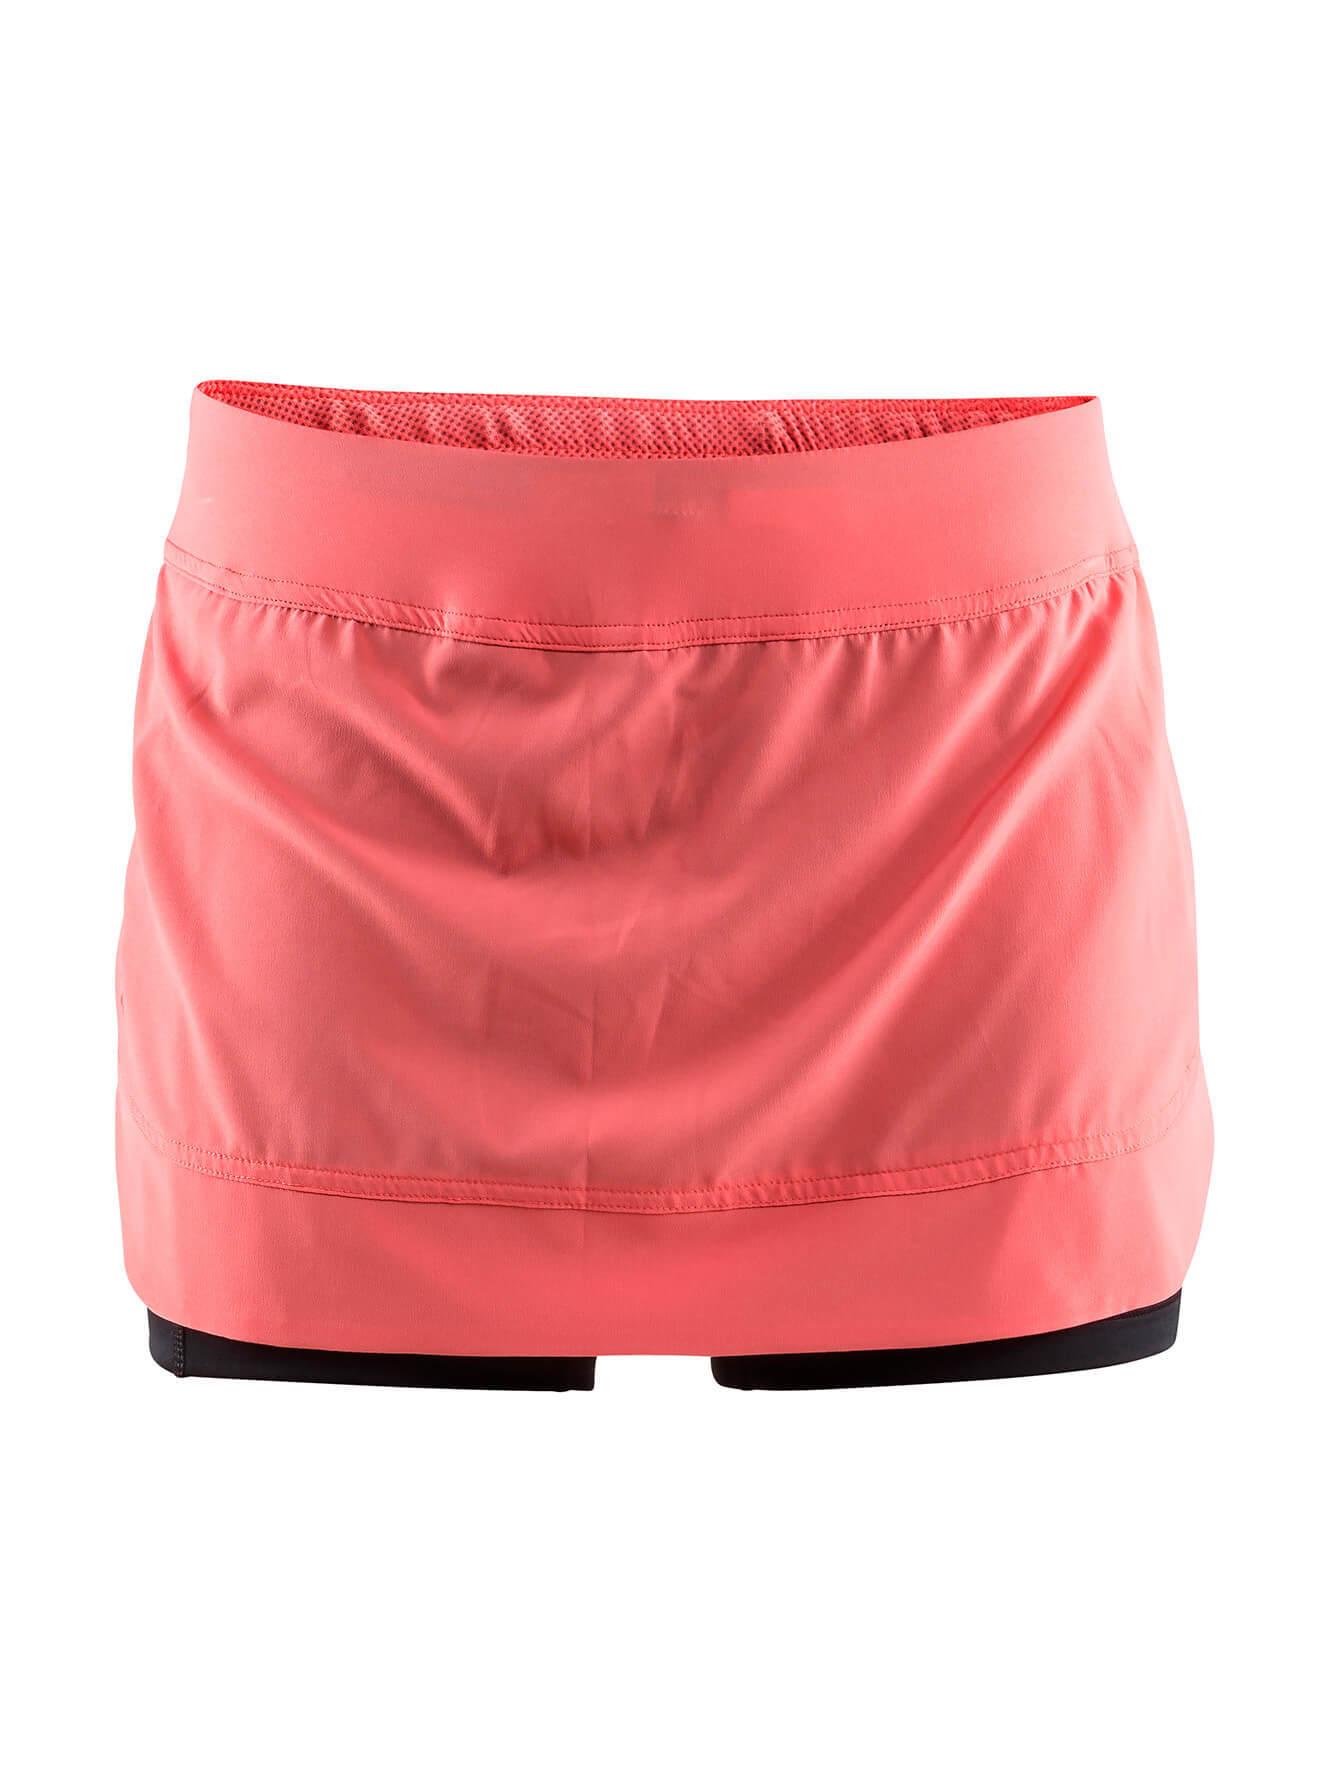 Craft Pep юбка женская - 1